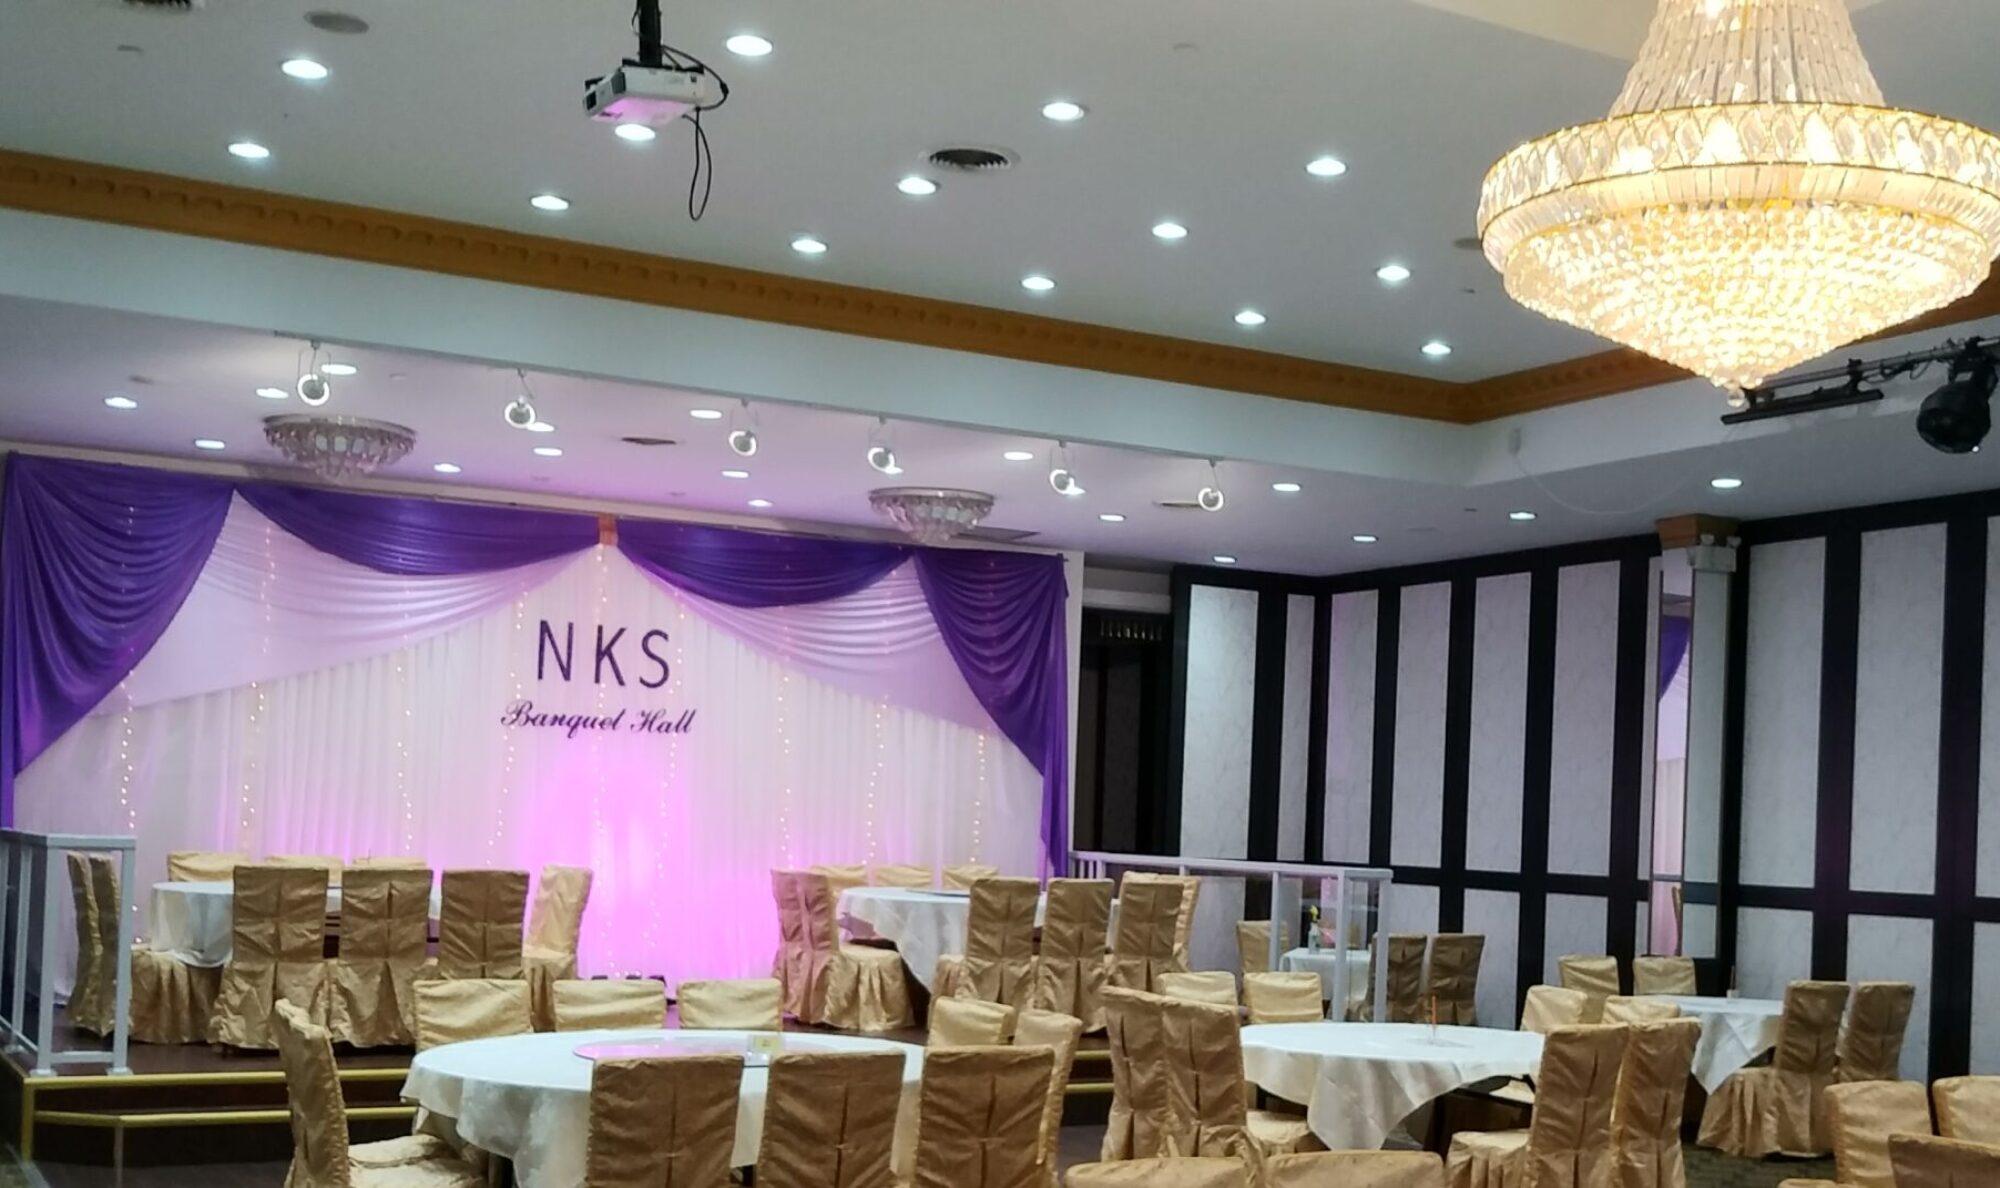 NKS Banquet Hall